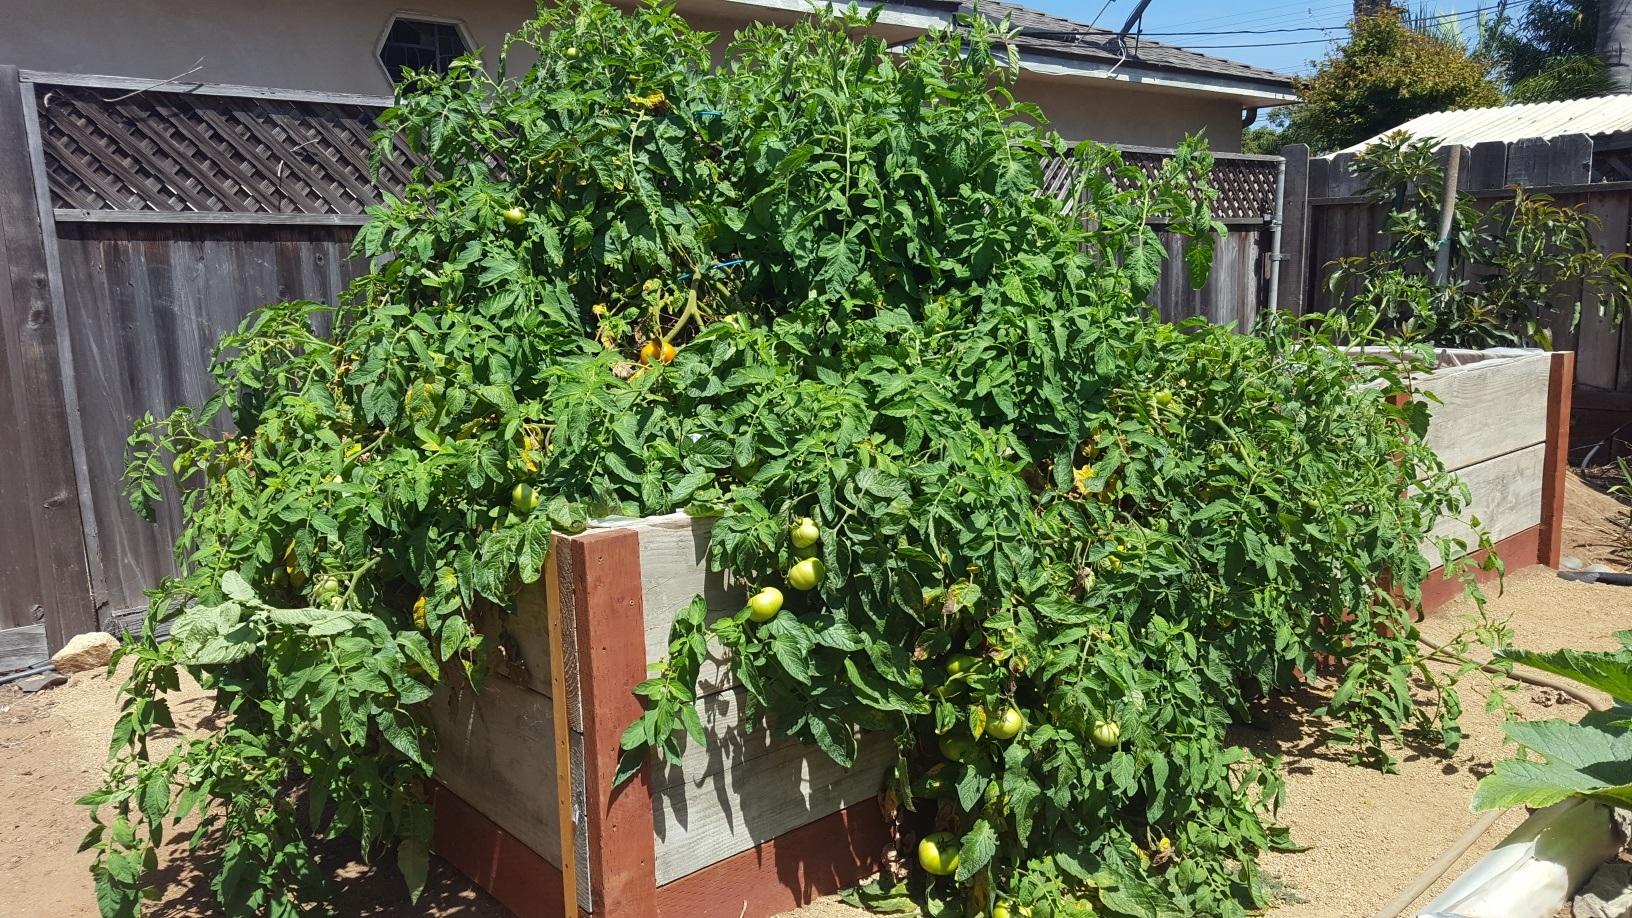 John Fuss, Sr., Child Welfare Services- Polinsky Children's Center, Grows Tomatoes.